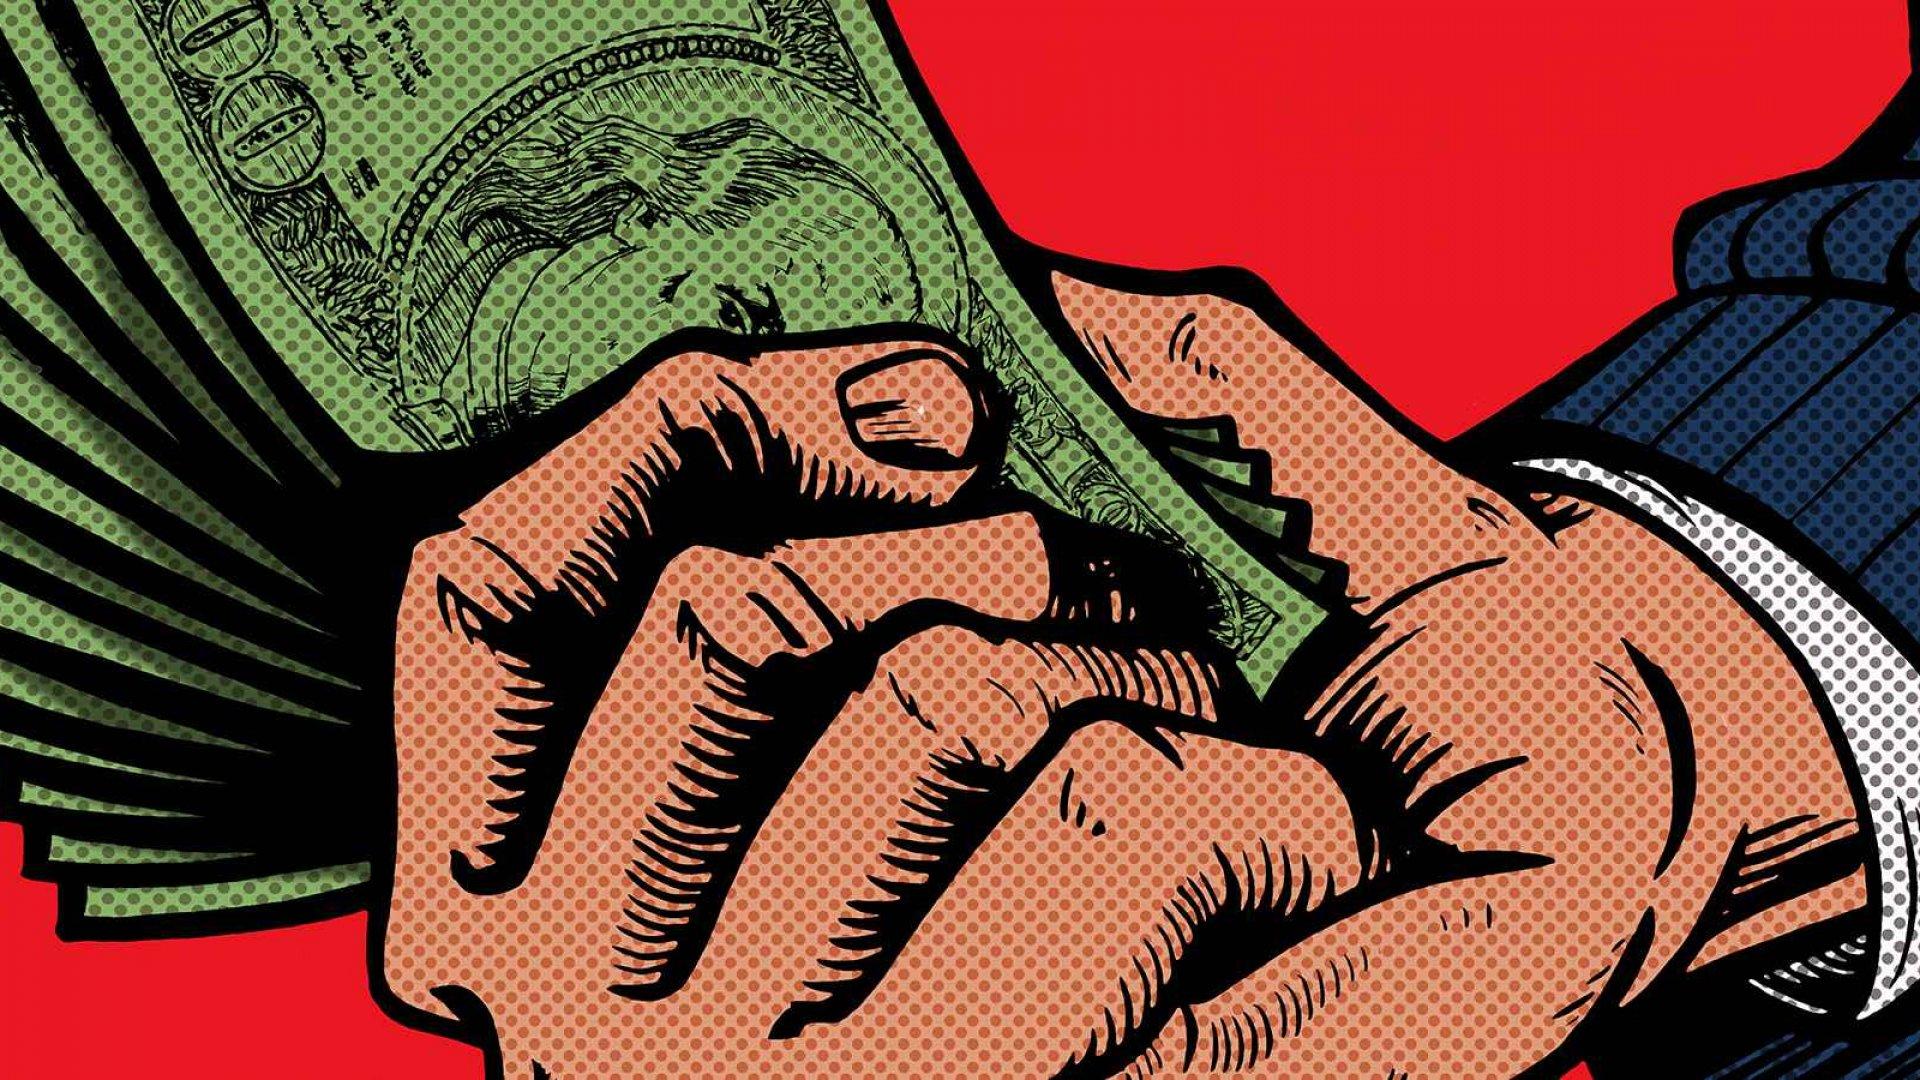 The 1 Secret That Sets Billionaires Apart From Everyone Else